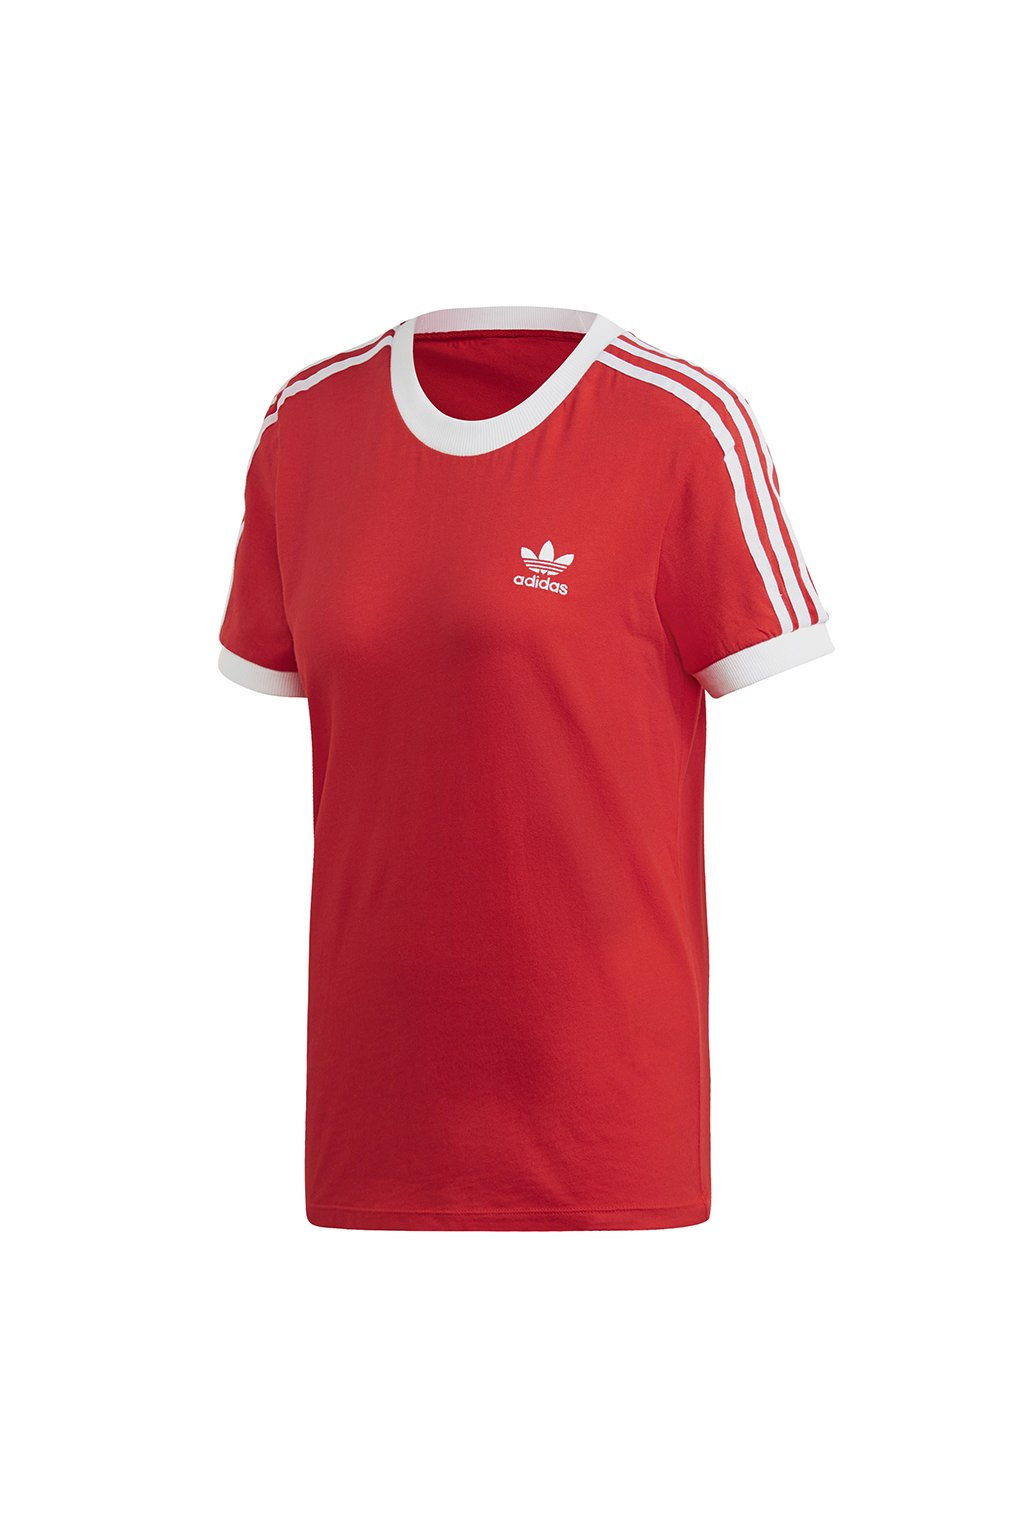 Dámske tričko Adidas 3 Stripes Tee W červené FM3318